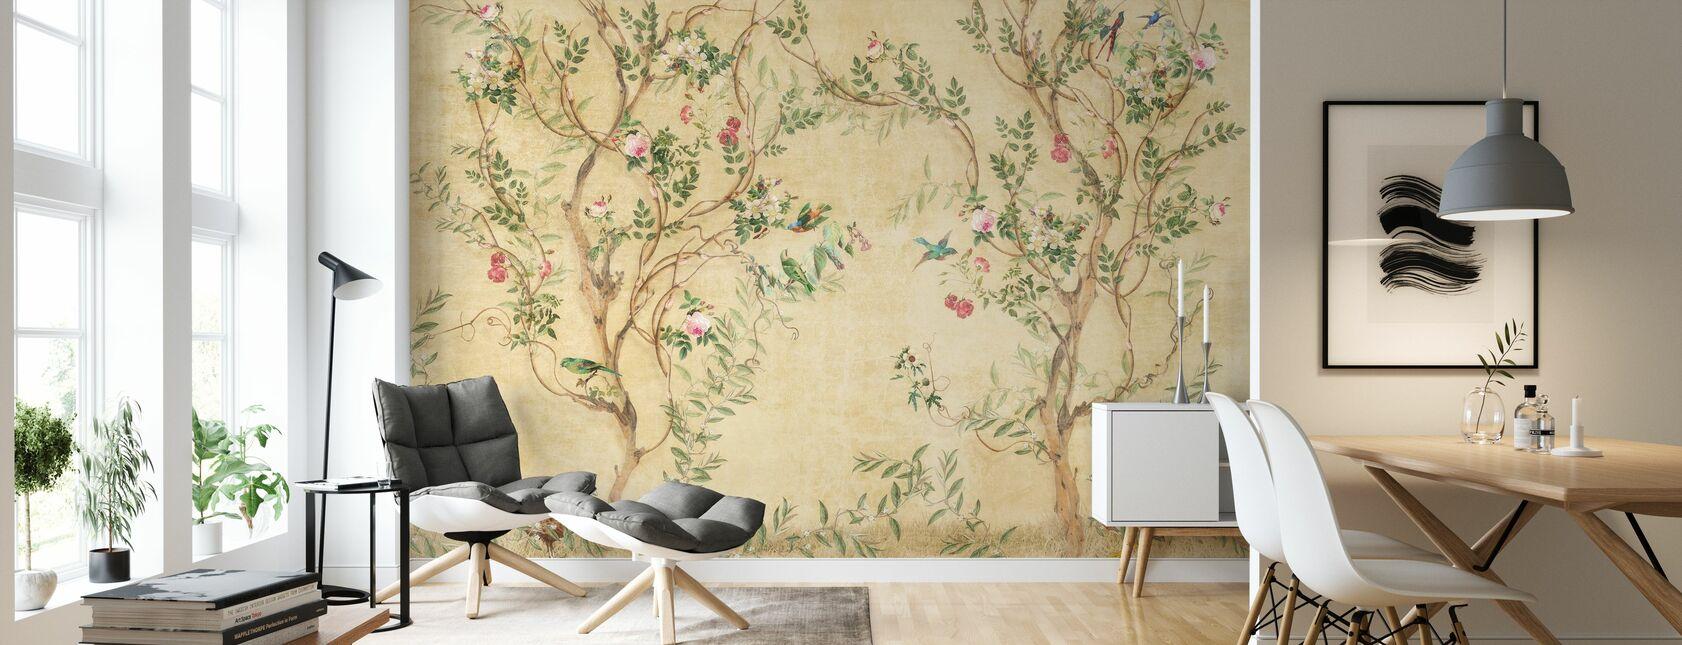 Mooie vogels in takken - Behang - Woonkamer